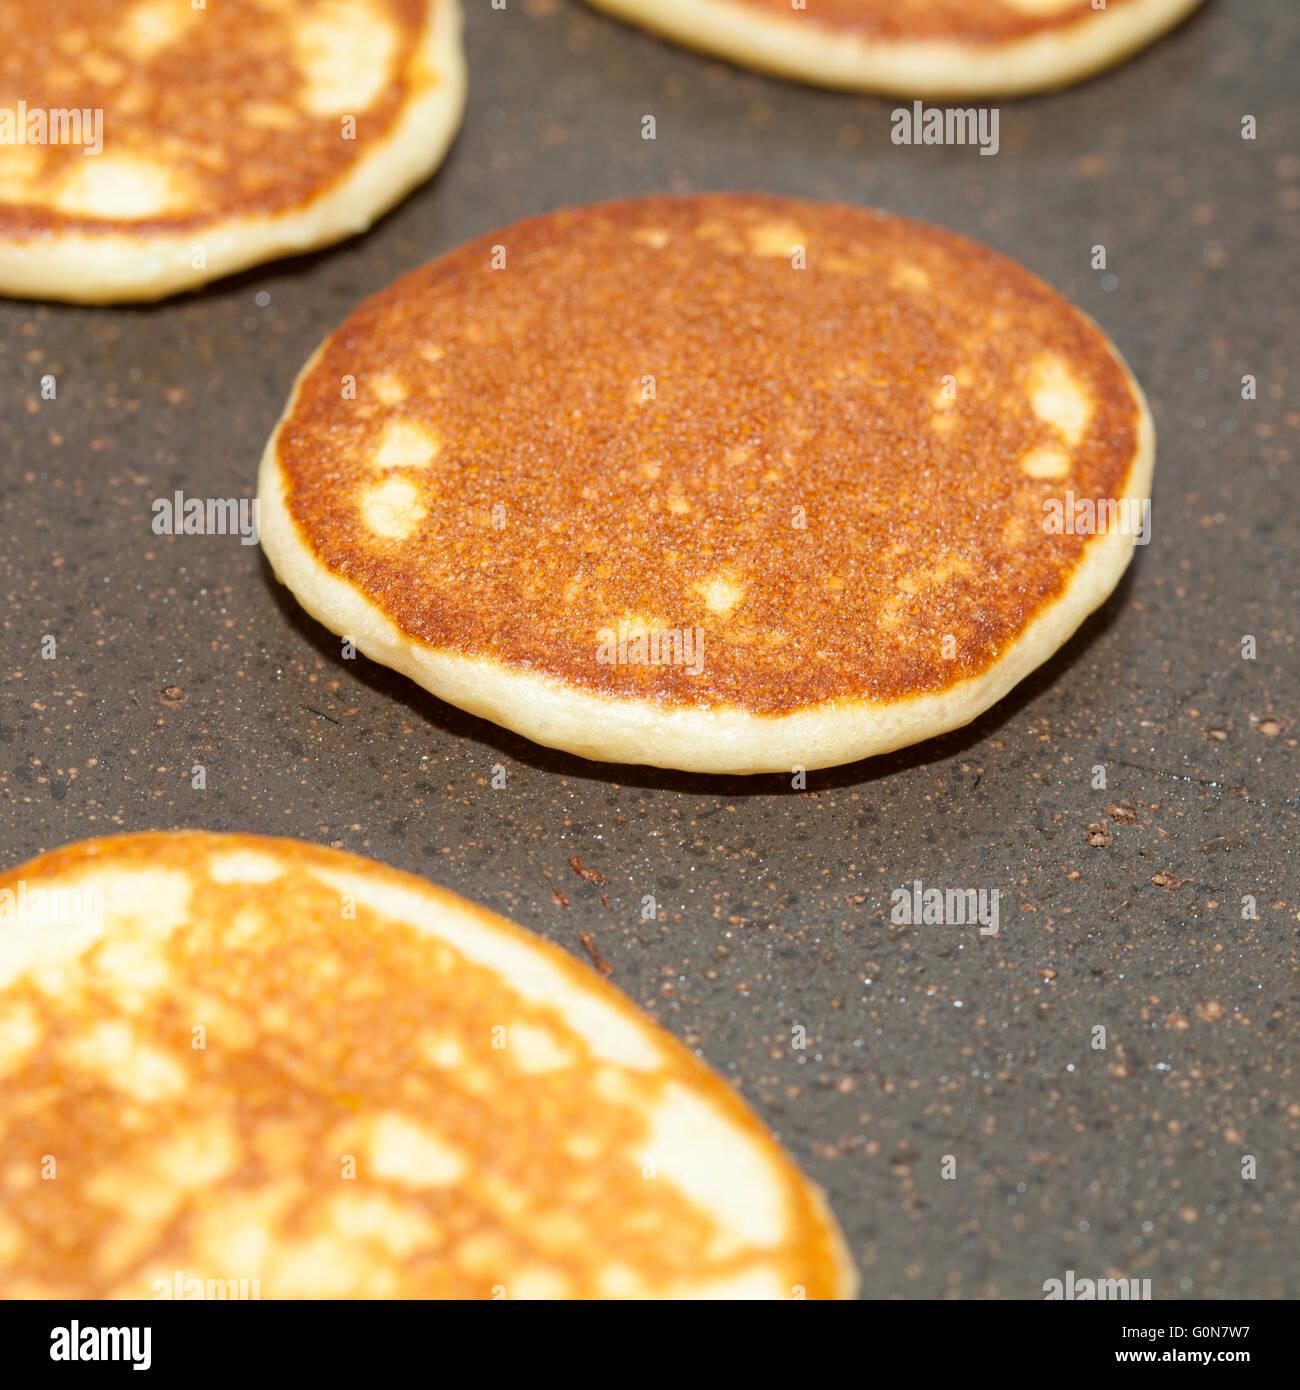 making thick potato cakes with yogurt - Stock Image